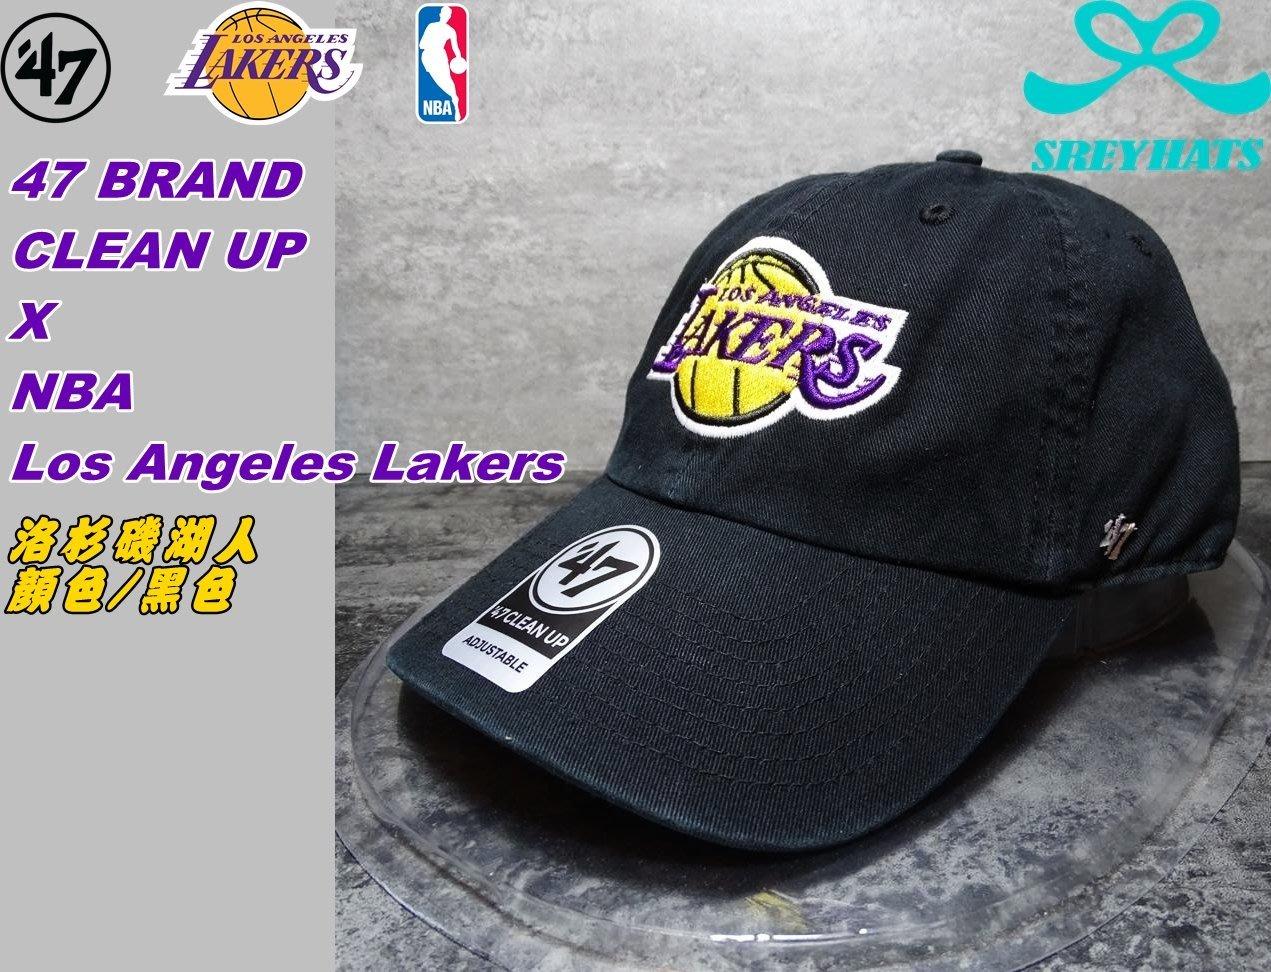 4b3c76e450ea  SREY帽屋 現貨*47 BRAND CLEAN UP NBA 洛杉磯湖人LA 經典LOGO 美國限定老帽棒球帽